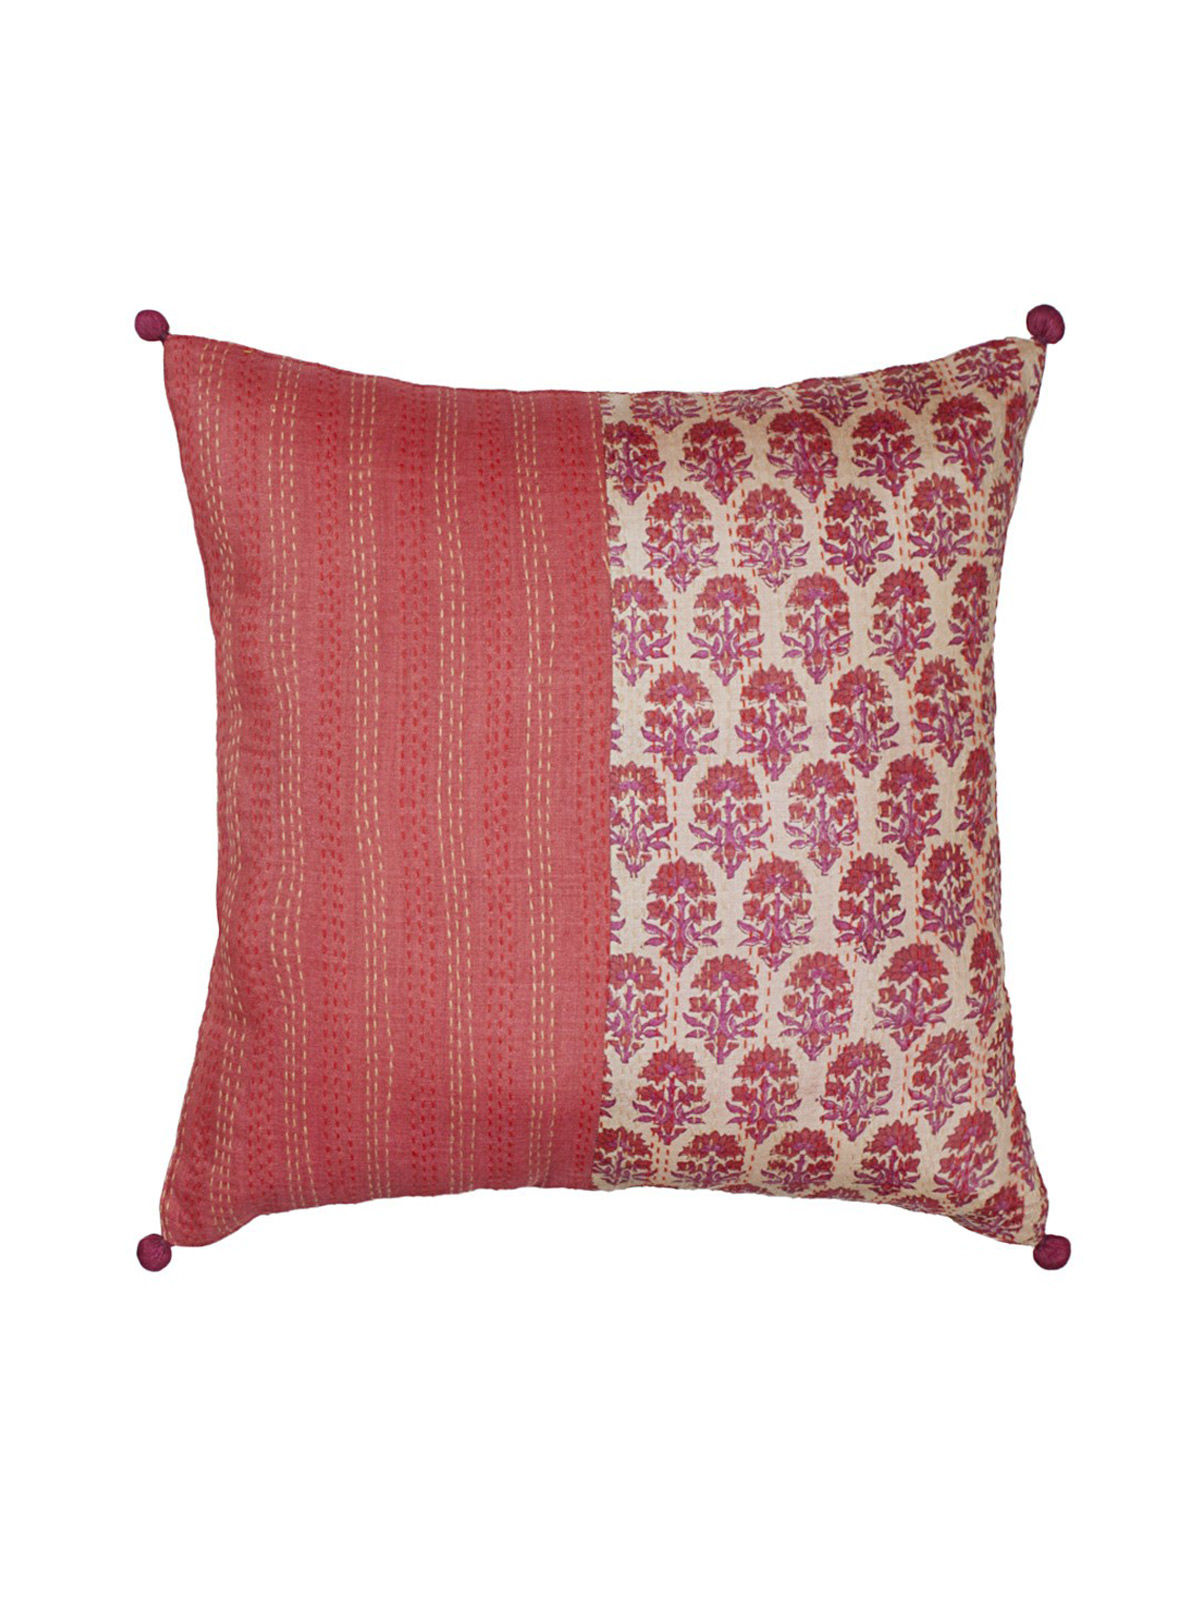 Red Half/Half Kantha Block printed Cushion Cover